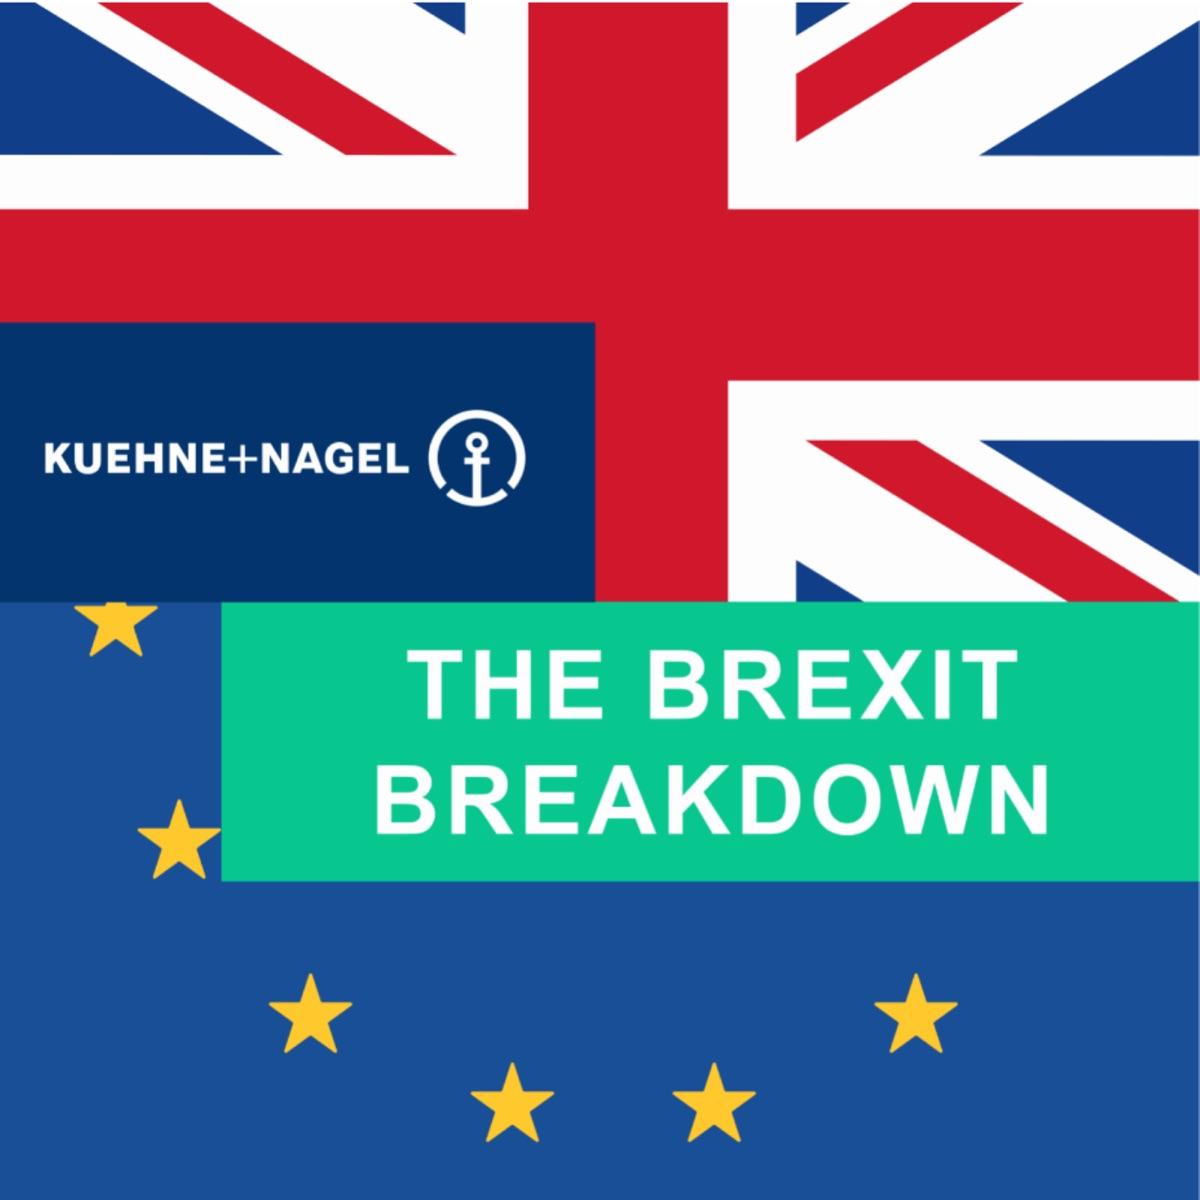 The Brexit Breakdown